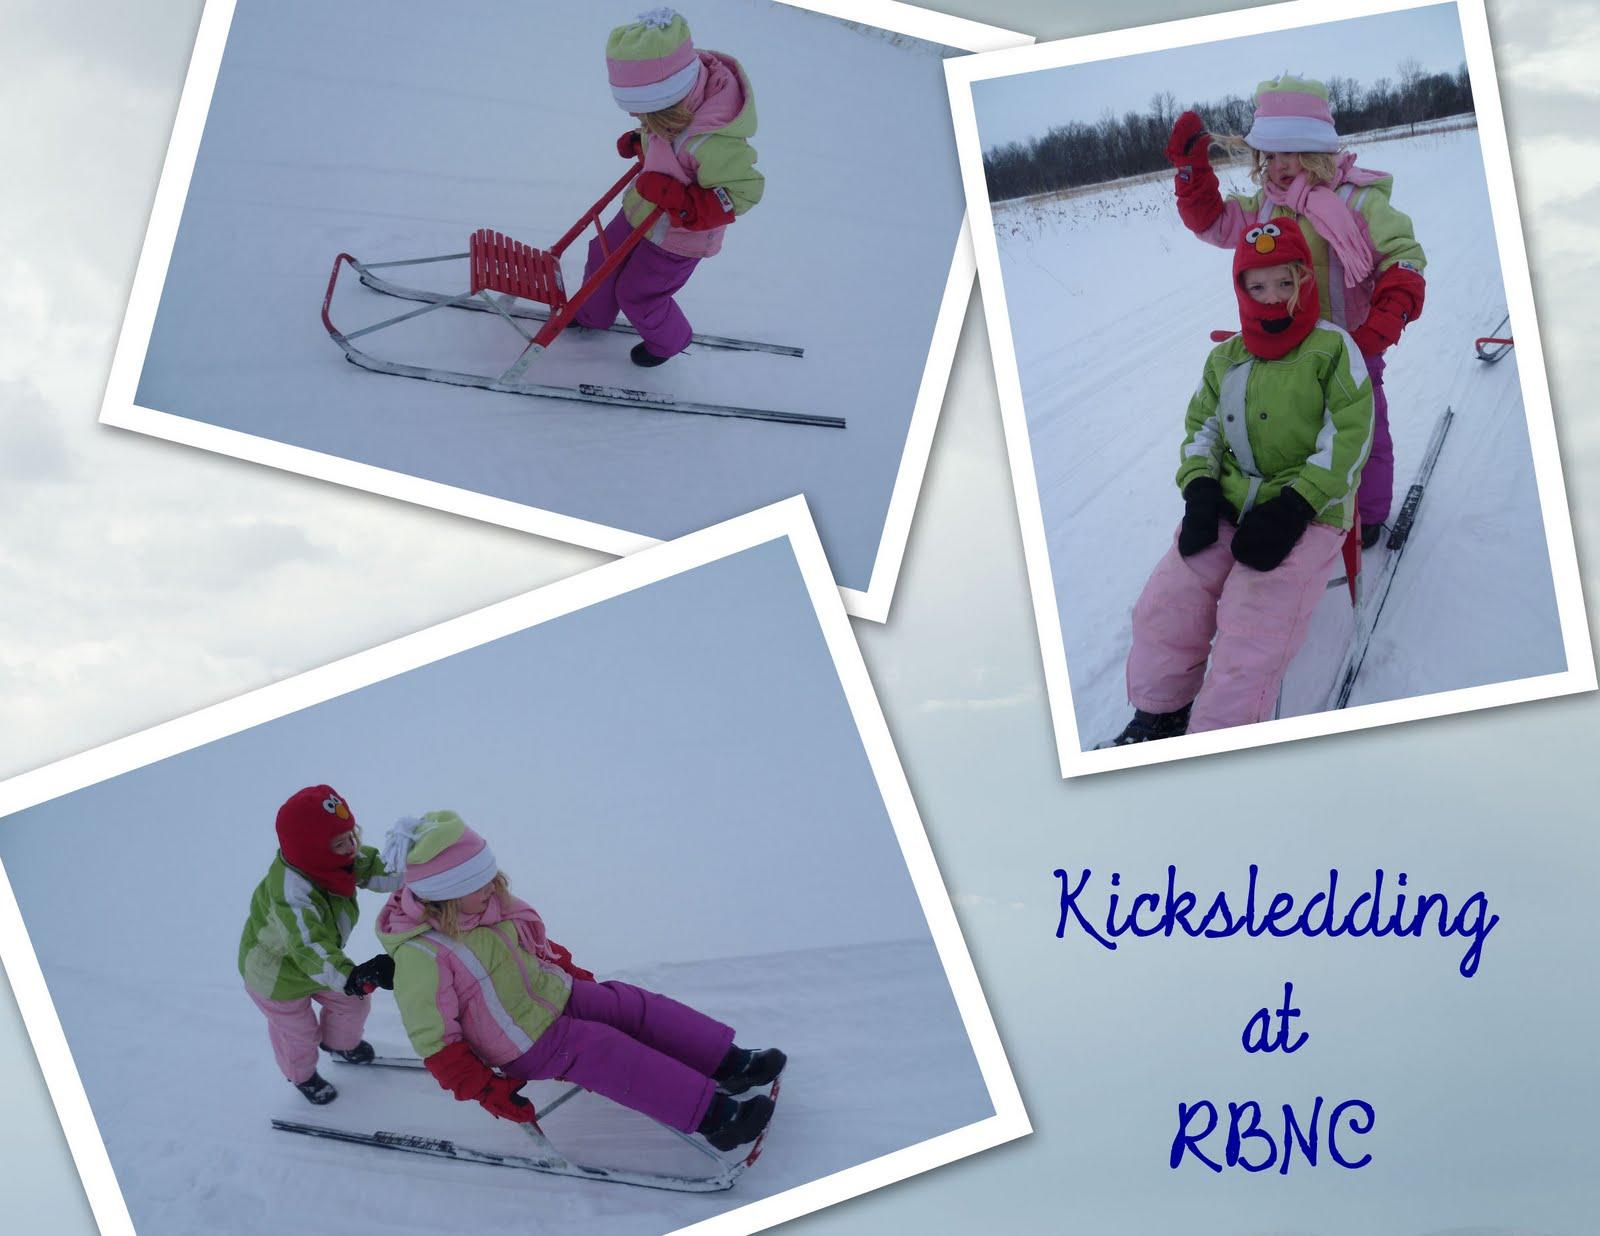 Kicksledding